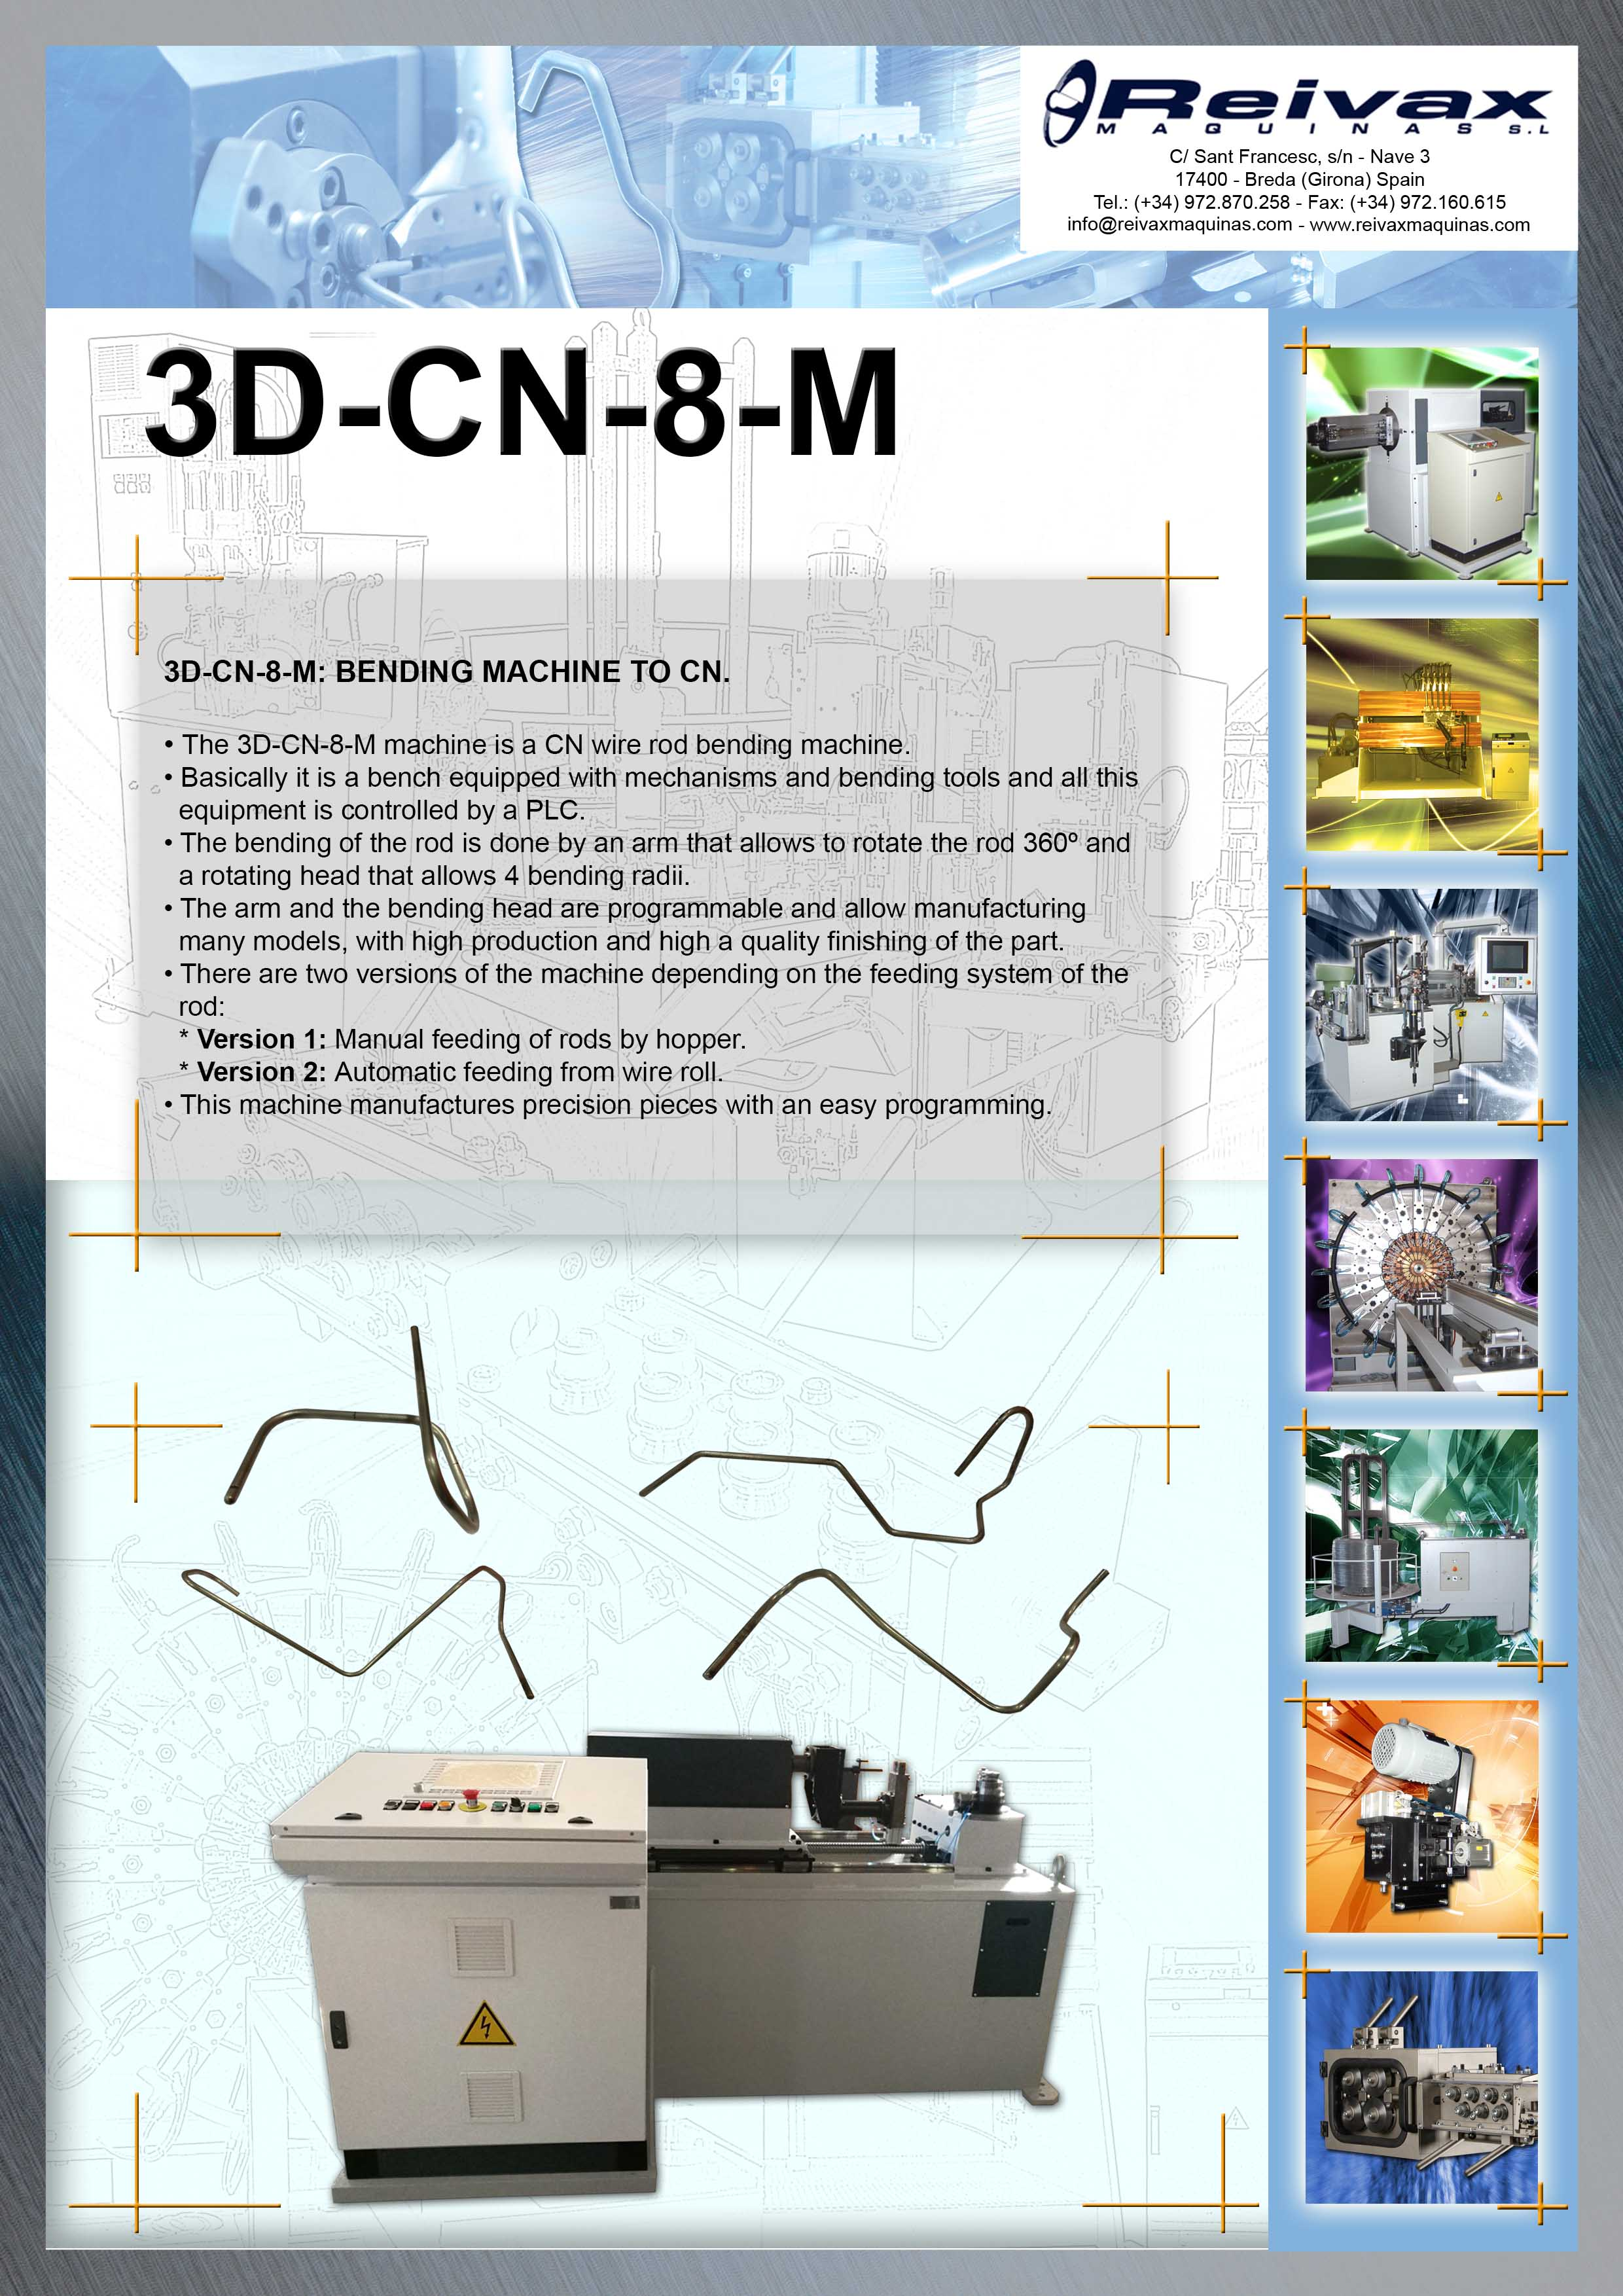 ReivaxMaquinas: Technical Details 3D-CN-8-M